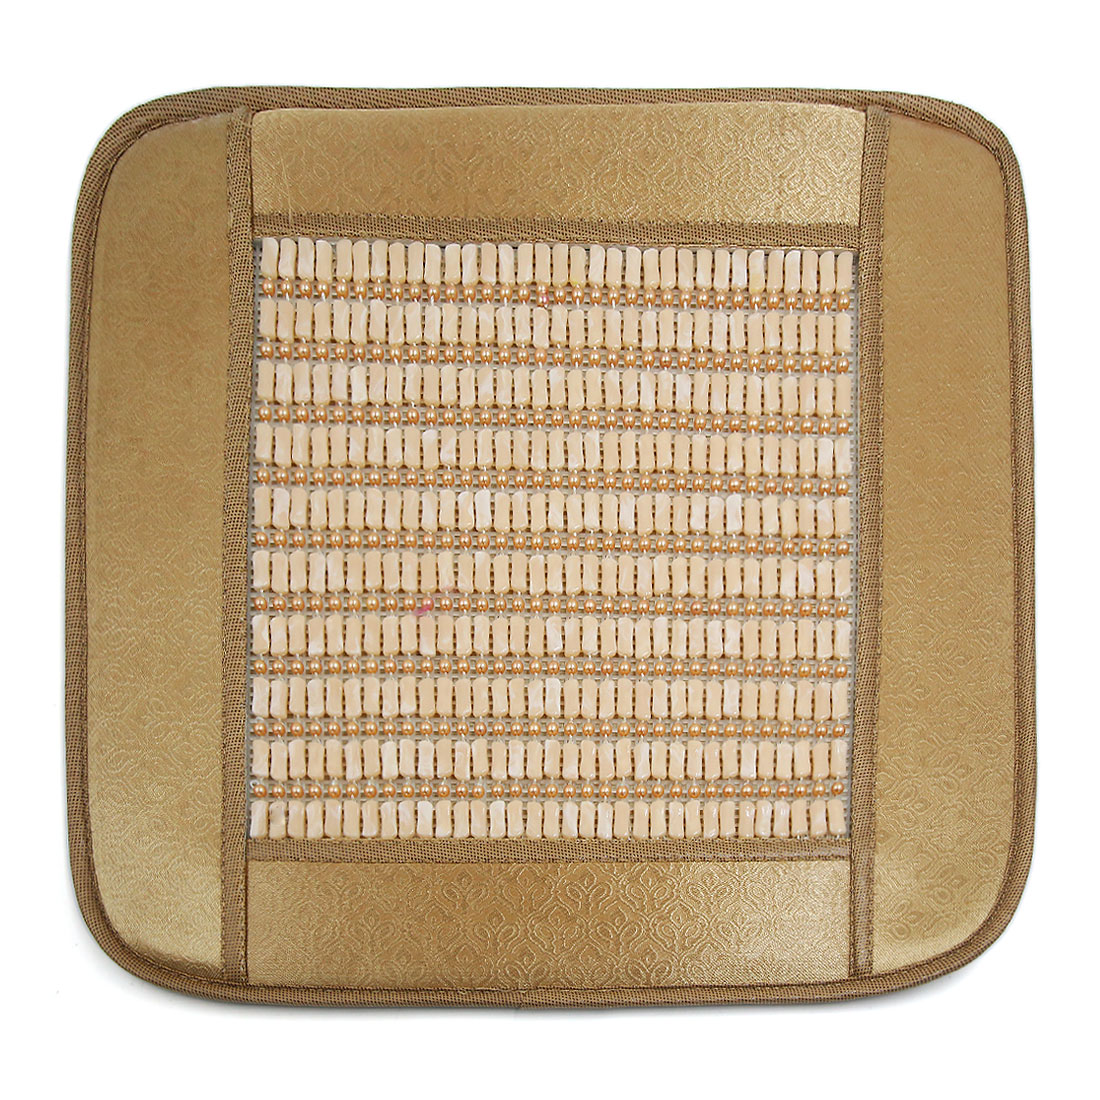 45 x 45cm Beige Sqaure Shape Multi Beads Desgin Seat Cushion Pad for Auto Car